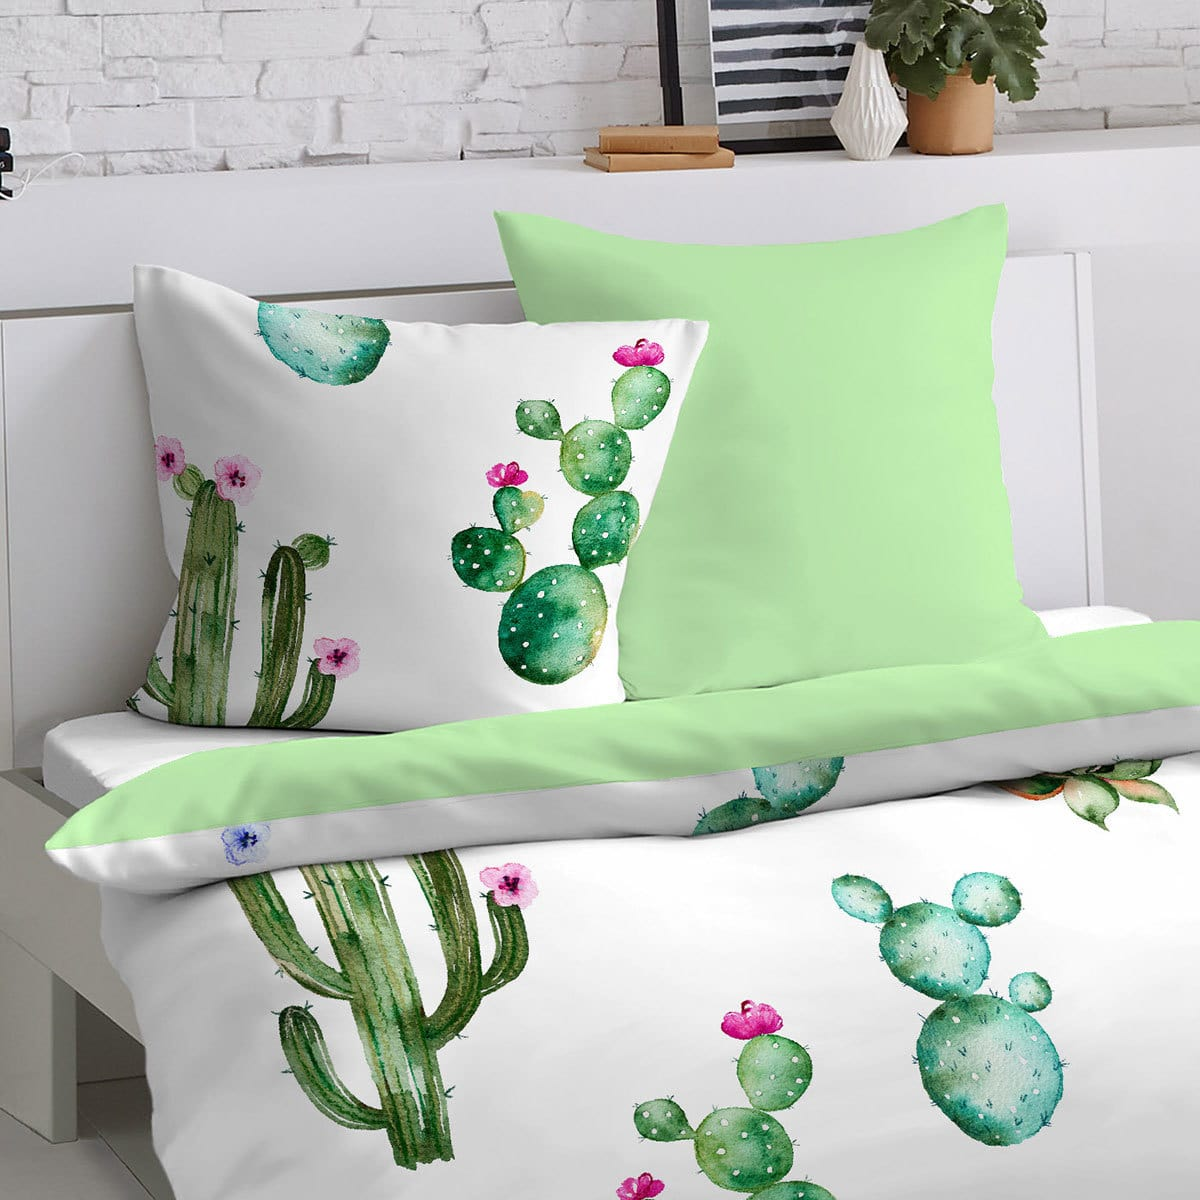 dormisette mako satin wendebettw sche kaktus g nstig. Black Bedroom Furniture Sets. Home Design Ideas